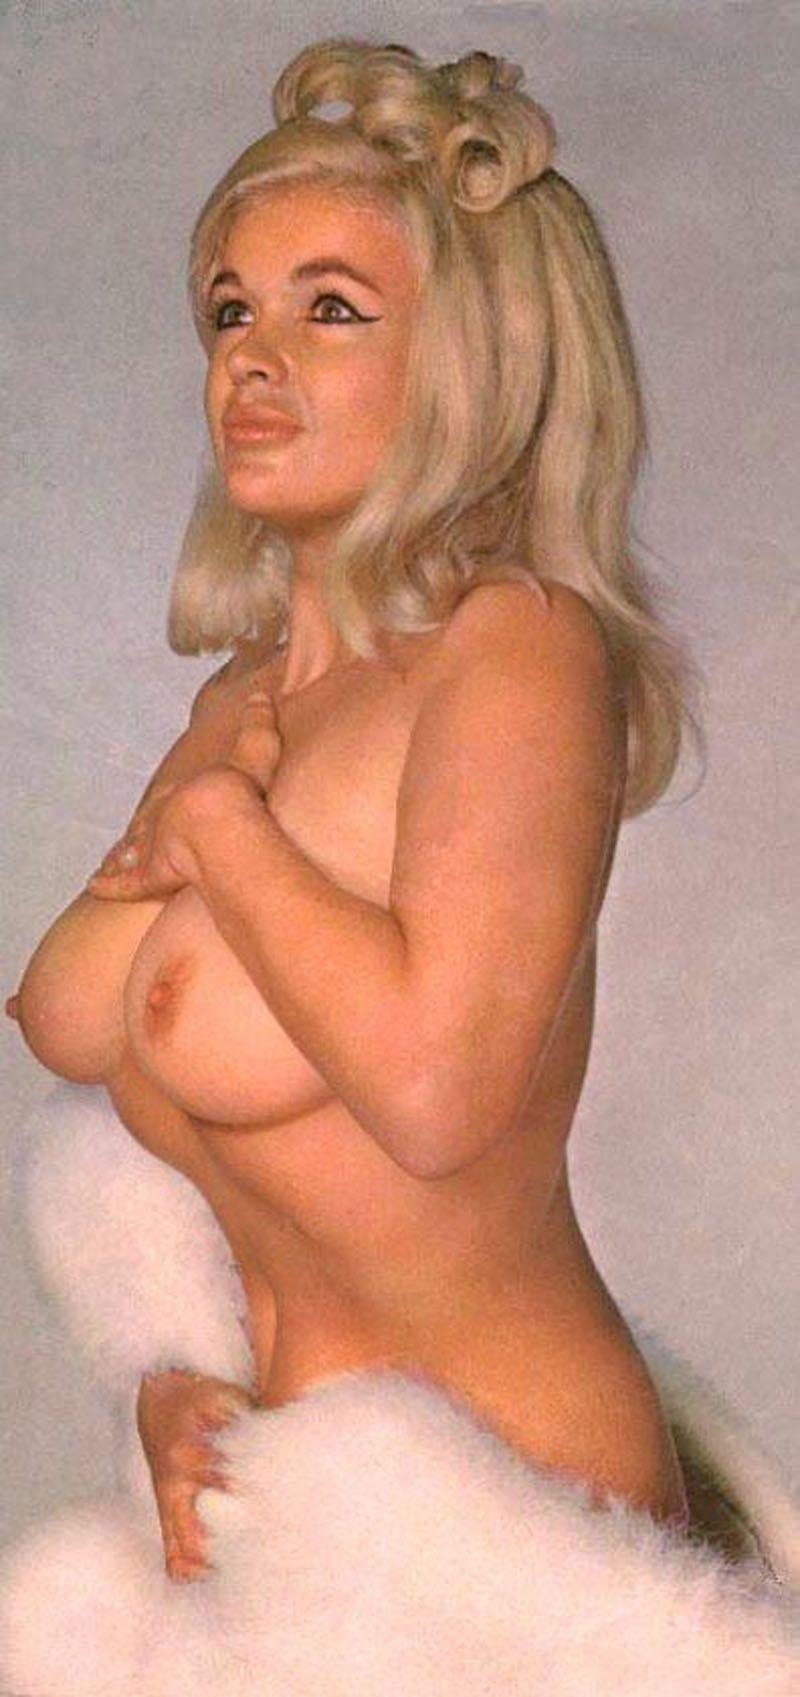 who-like-jayne-mansfield-porn-scene-naked-showers